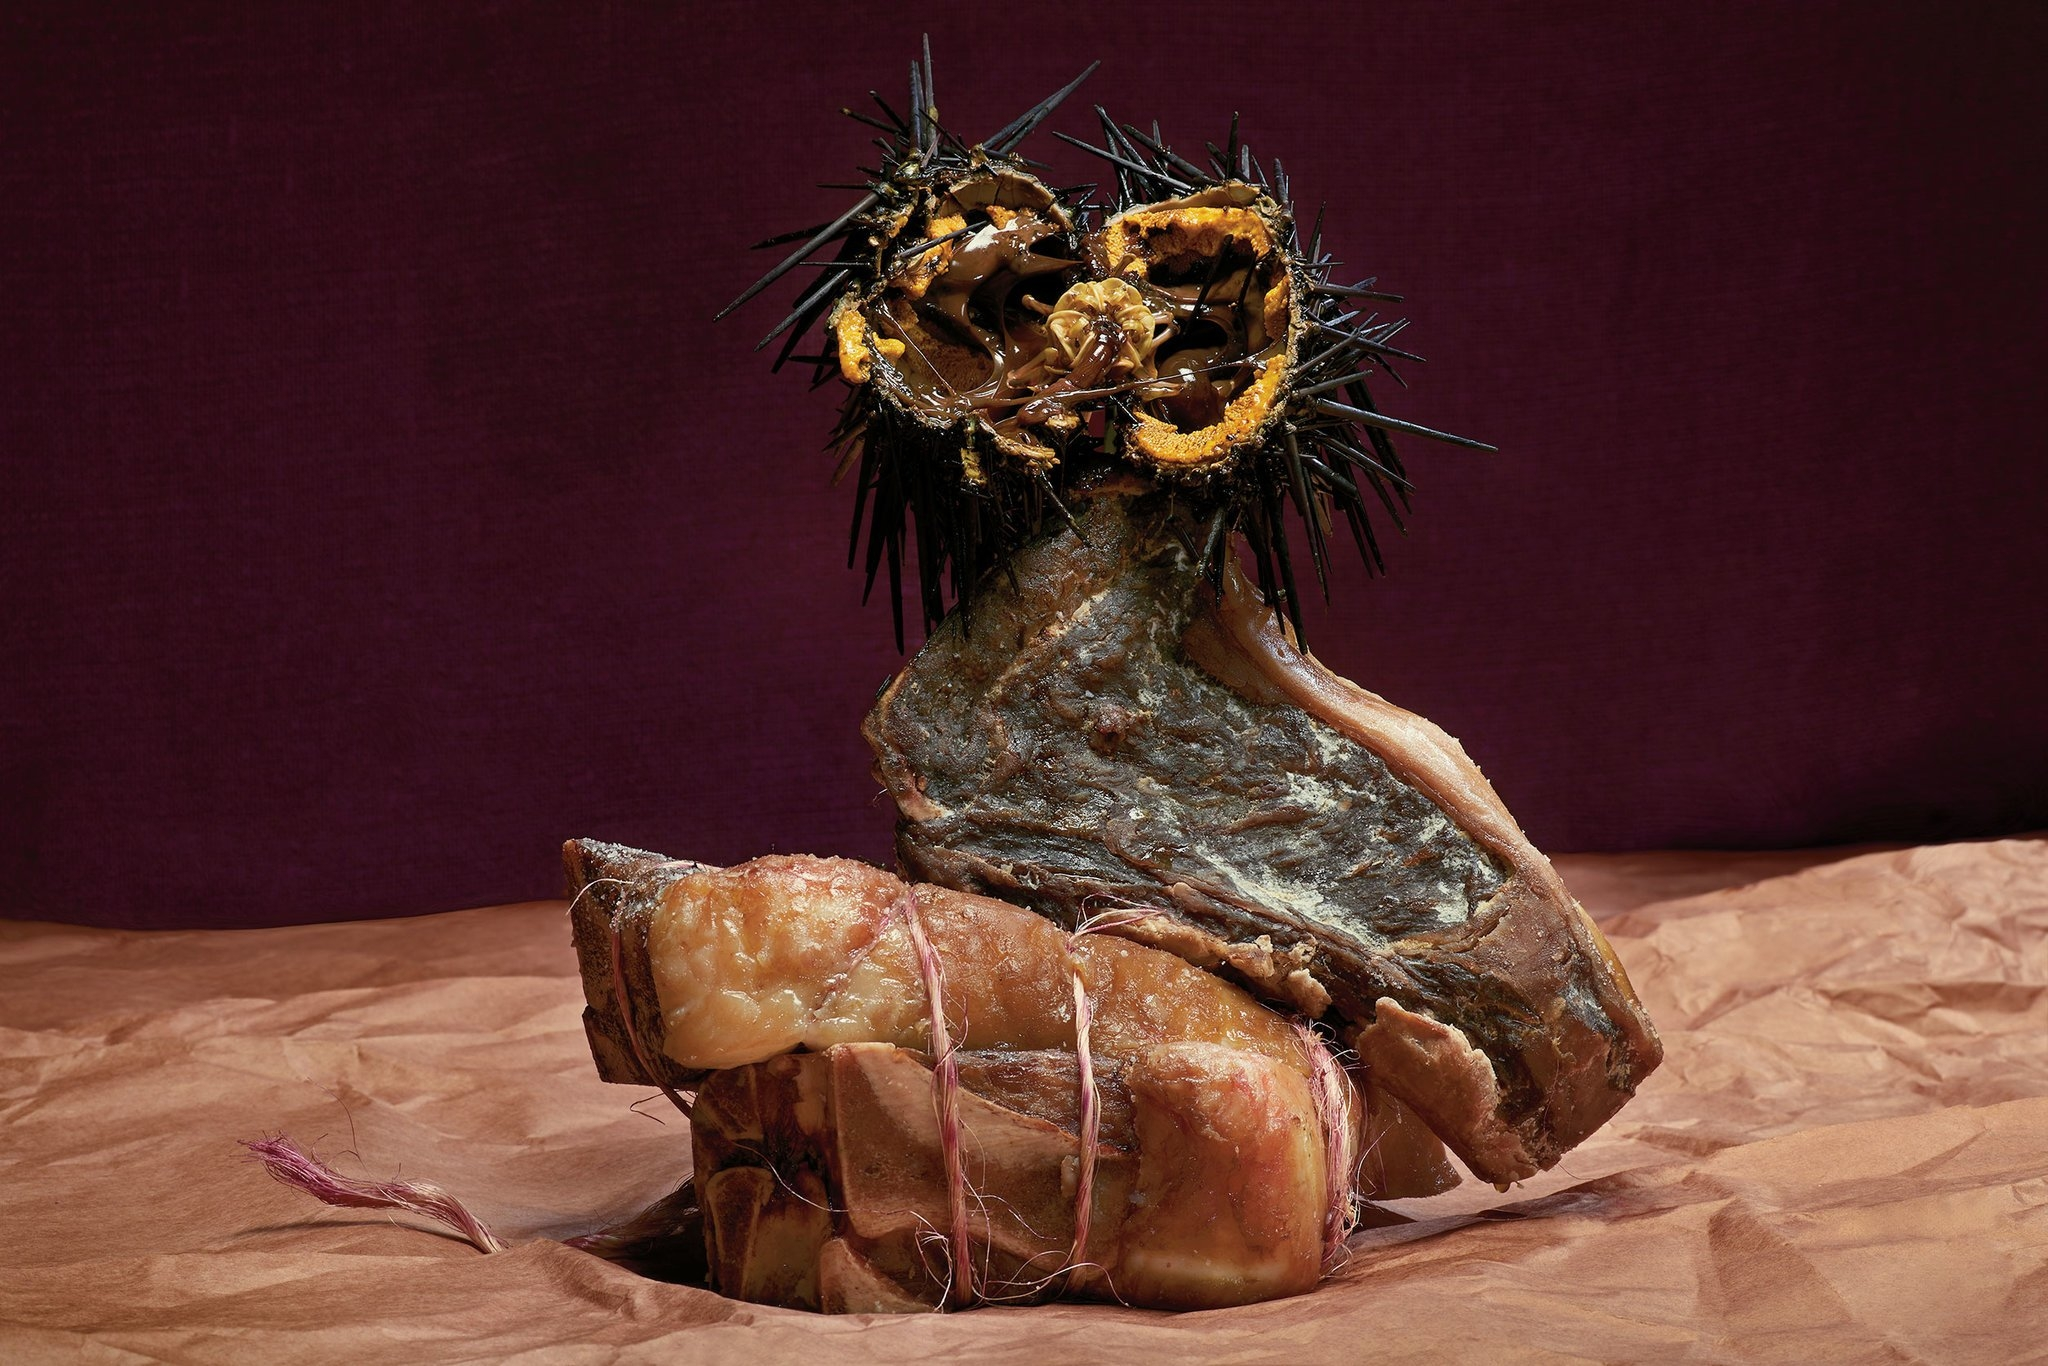 NY Times Magazine - The Novel Taste of Old Food